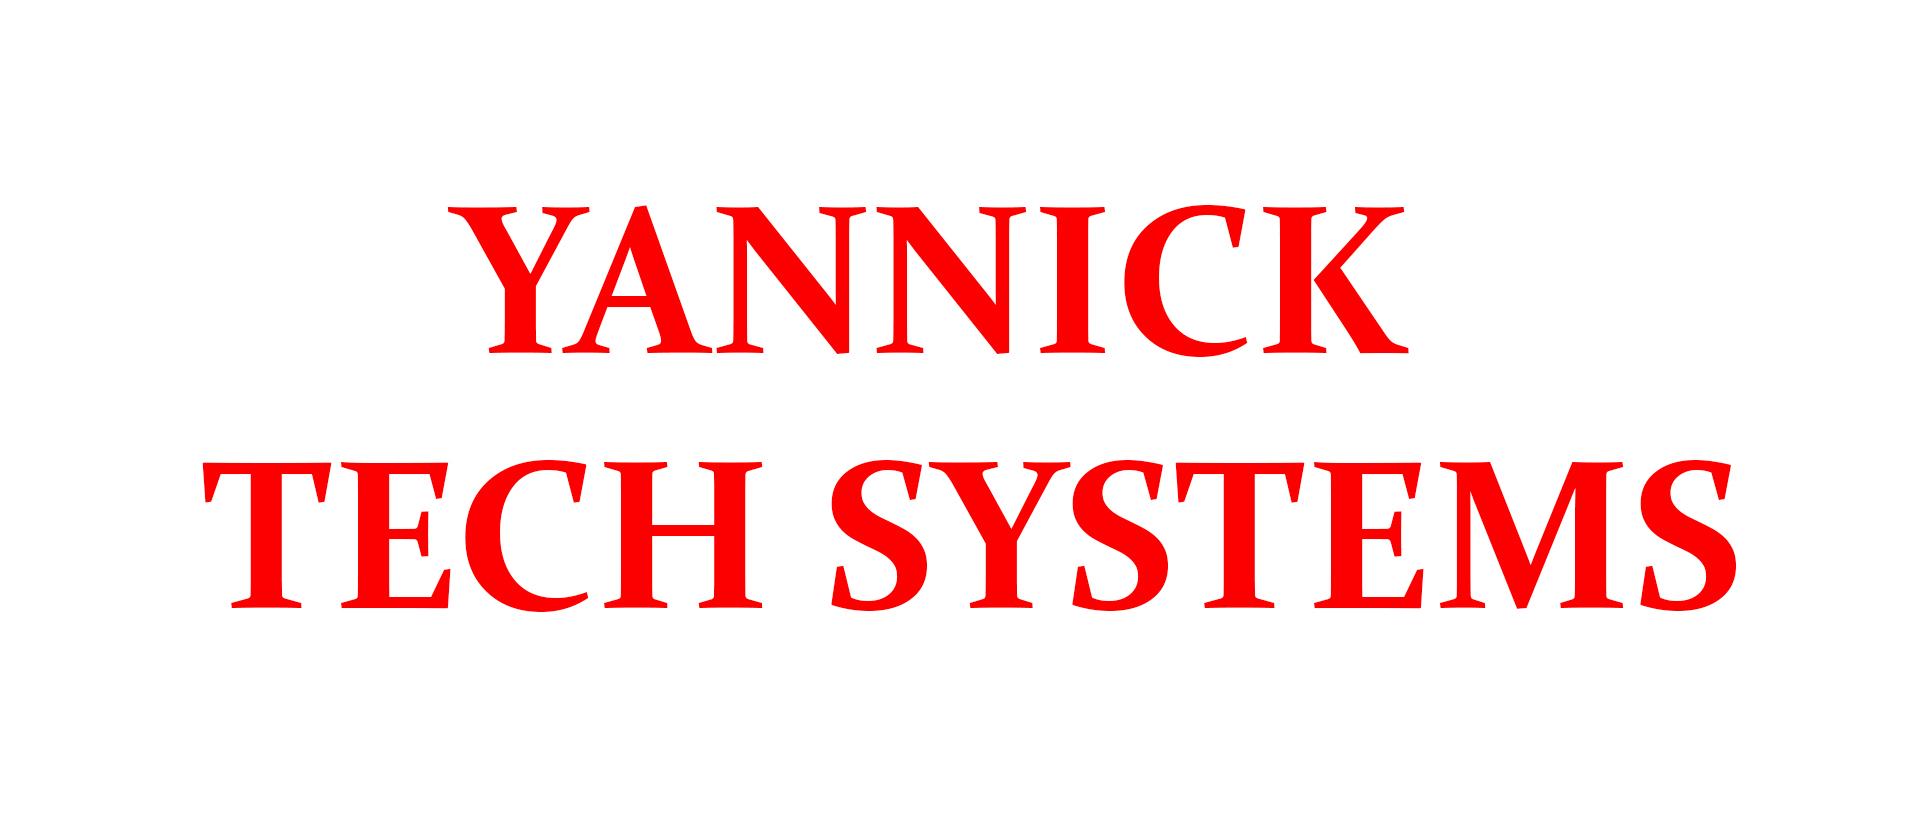 YANNICK TECH SYSTEMS 2018-19